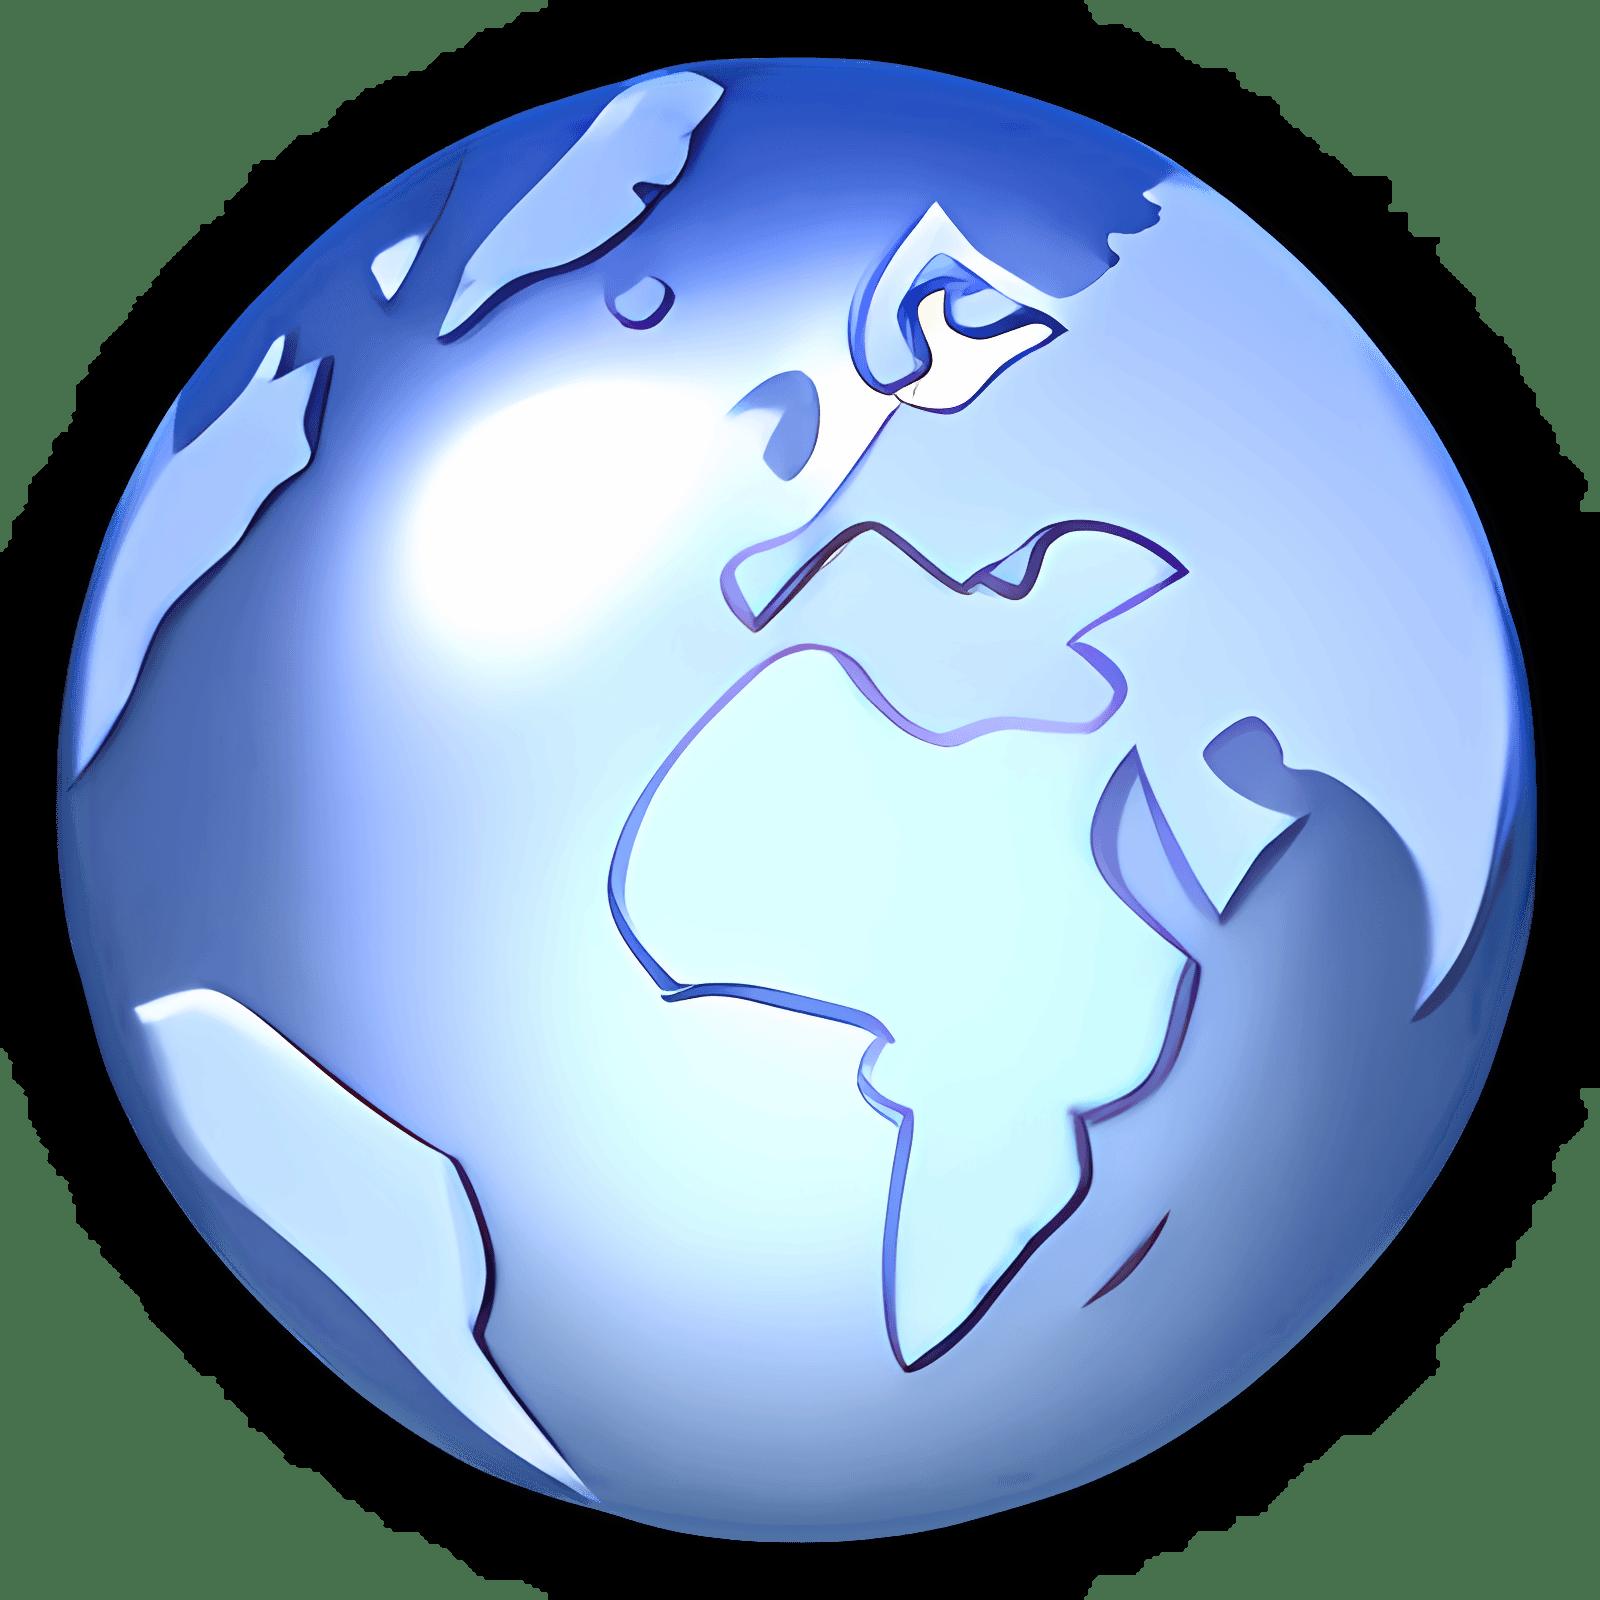 Earth Alerts 2014 1.2